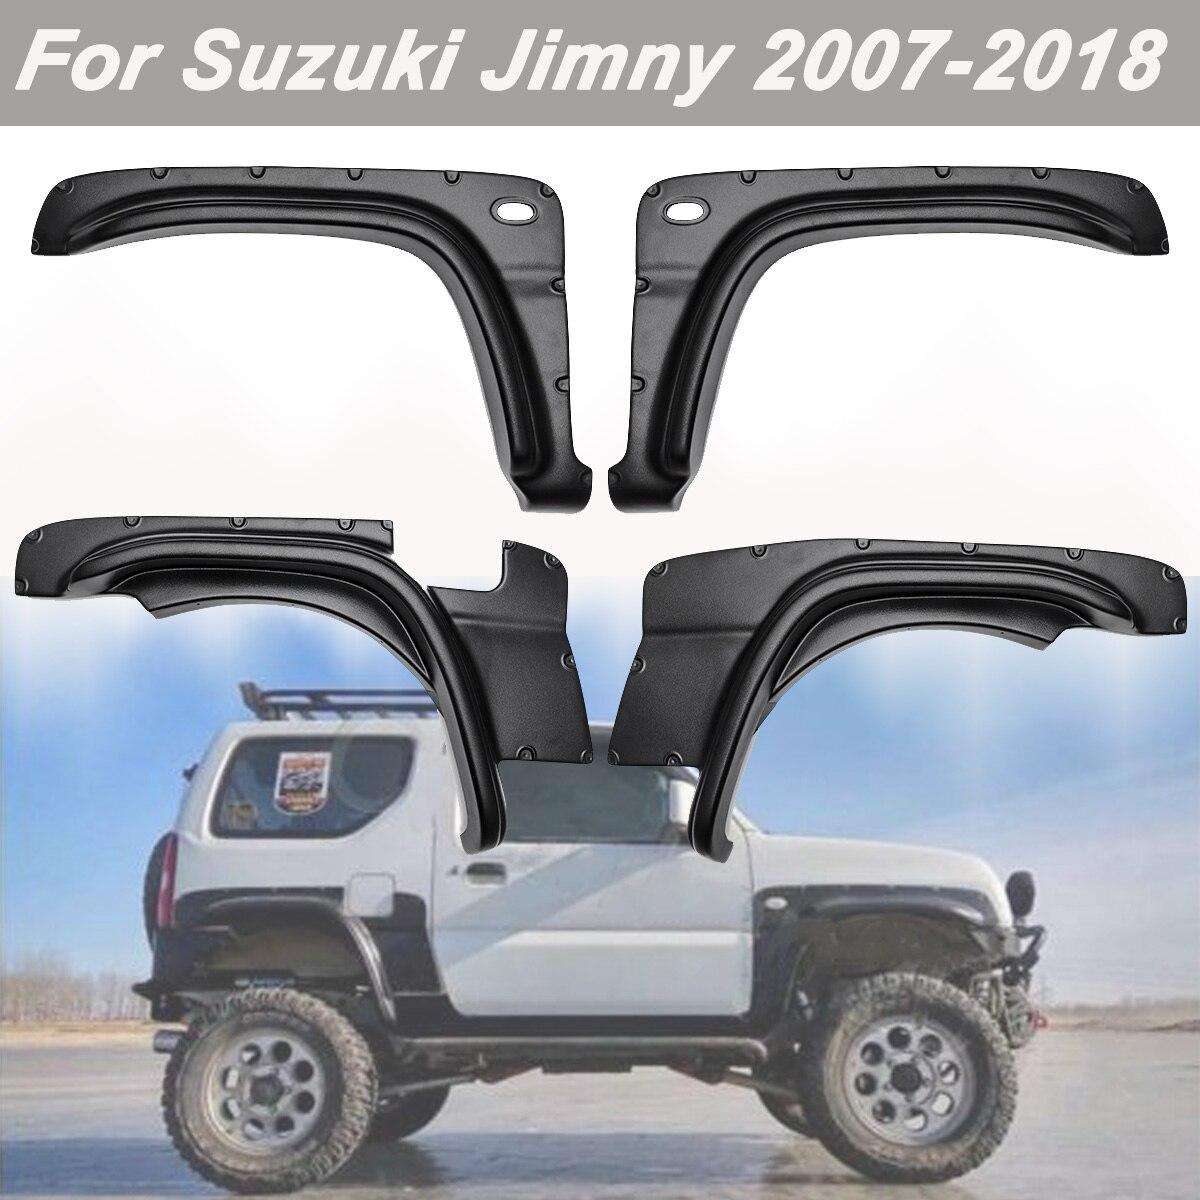 4 Pcs ล้อรถคิ้วรอบ Arc Fender Mudguards Splash Guards สำหรับ Suzuki jimny 2007-2017